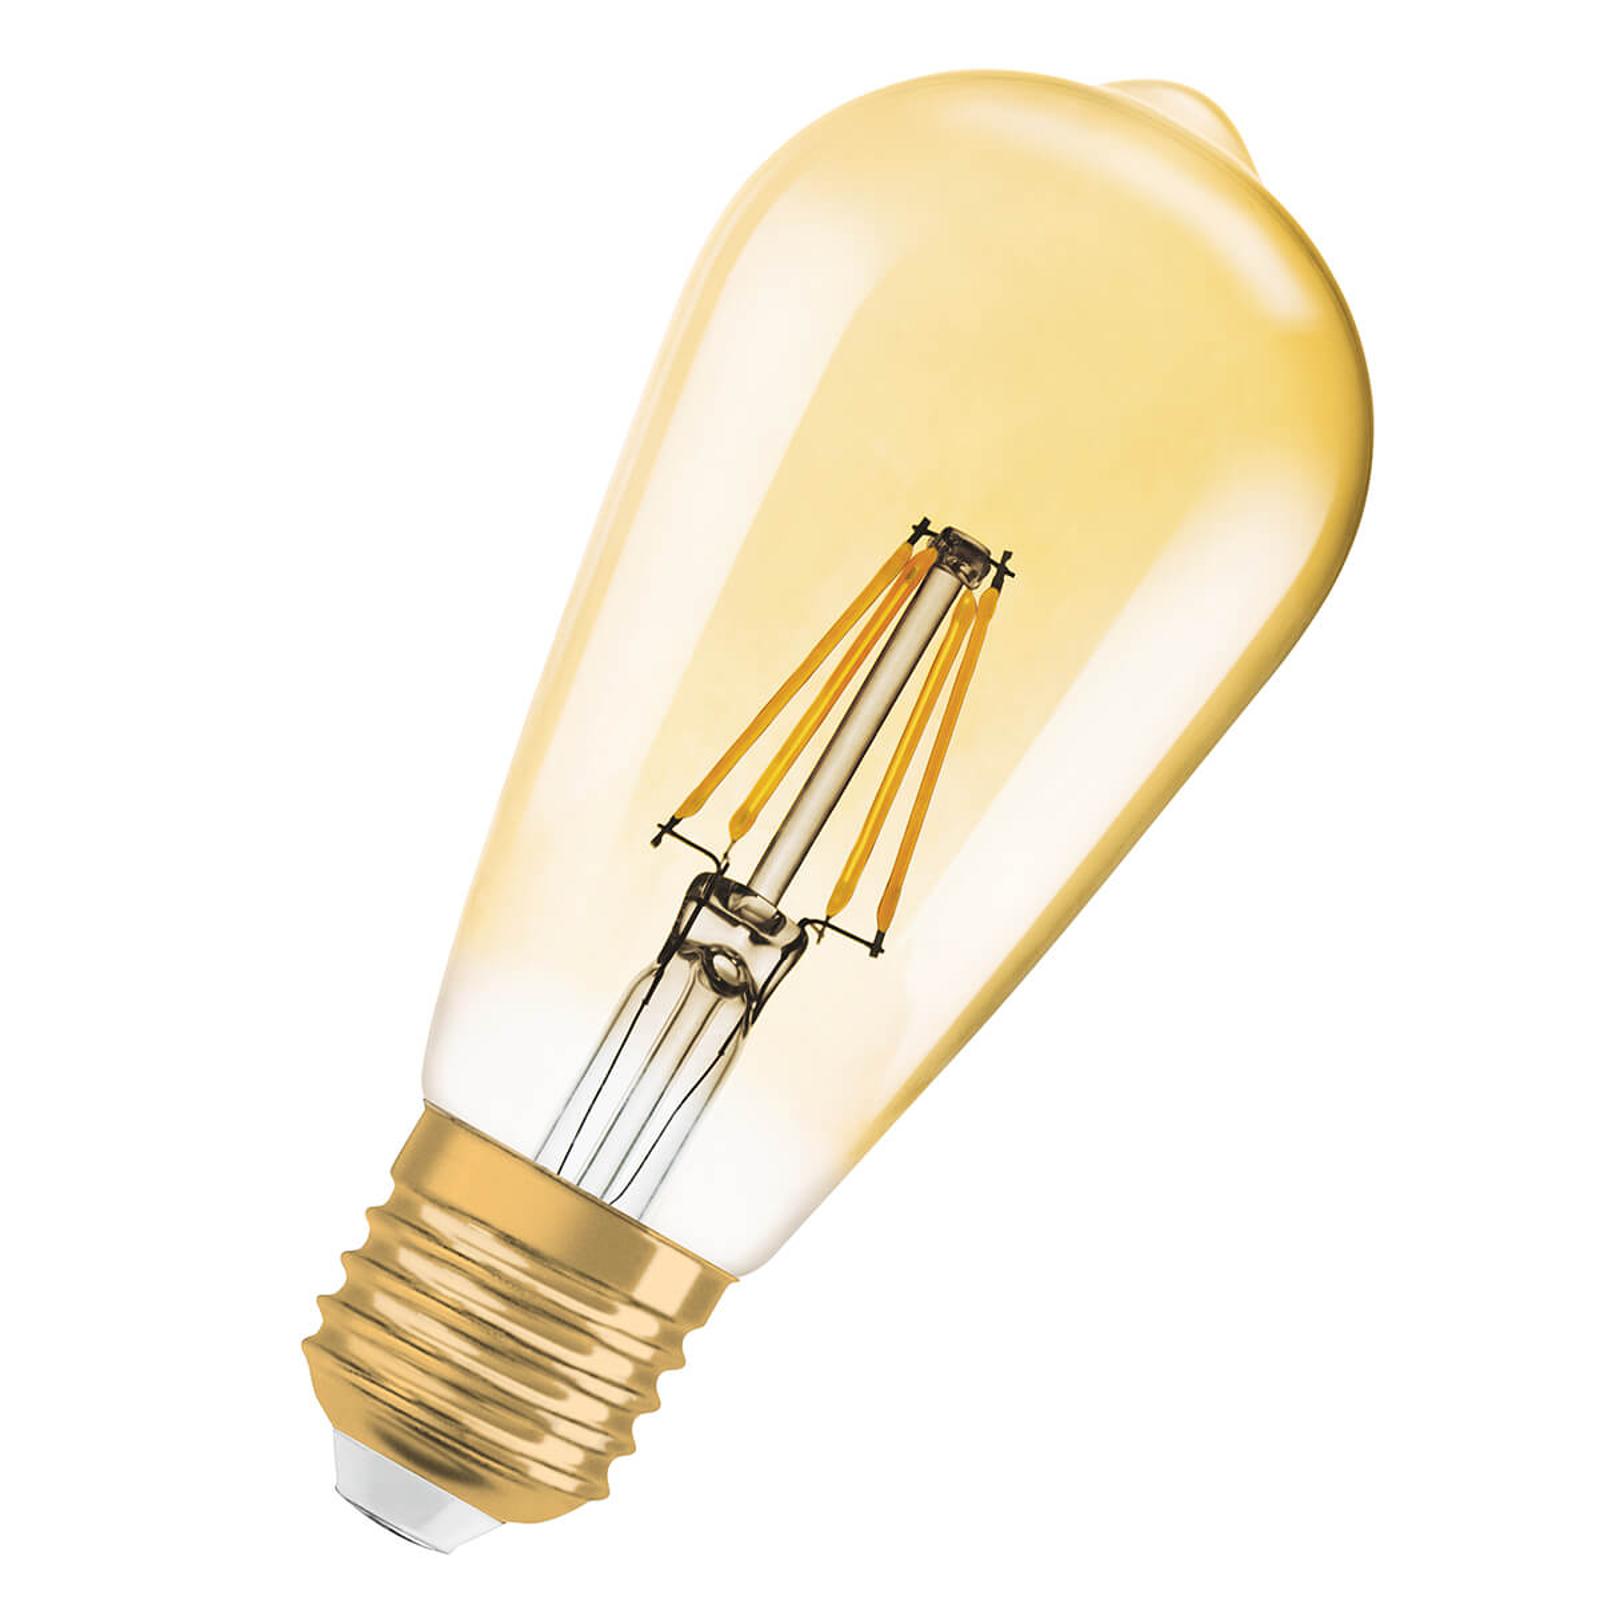 LED-Lampe Gold E27 2,5W, warmweiß, 225 Lumen